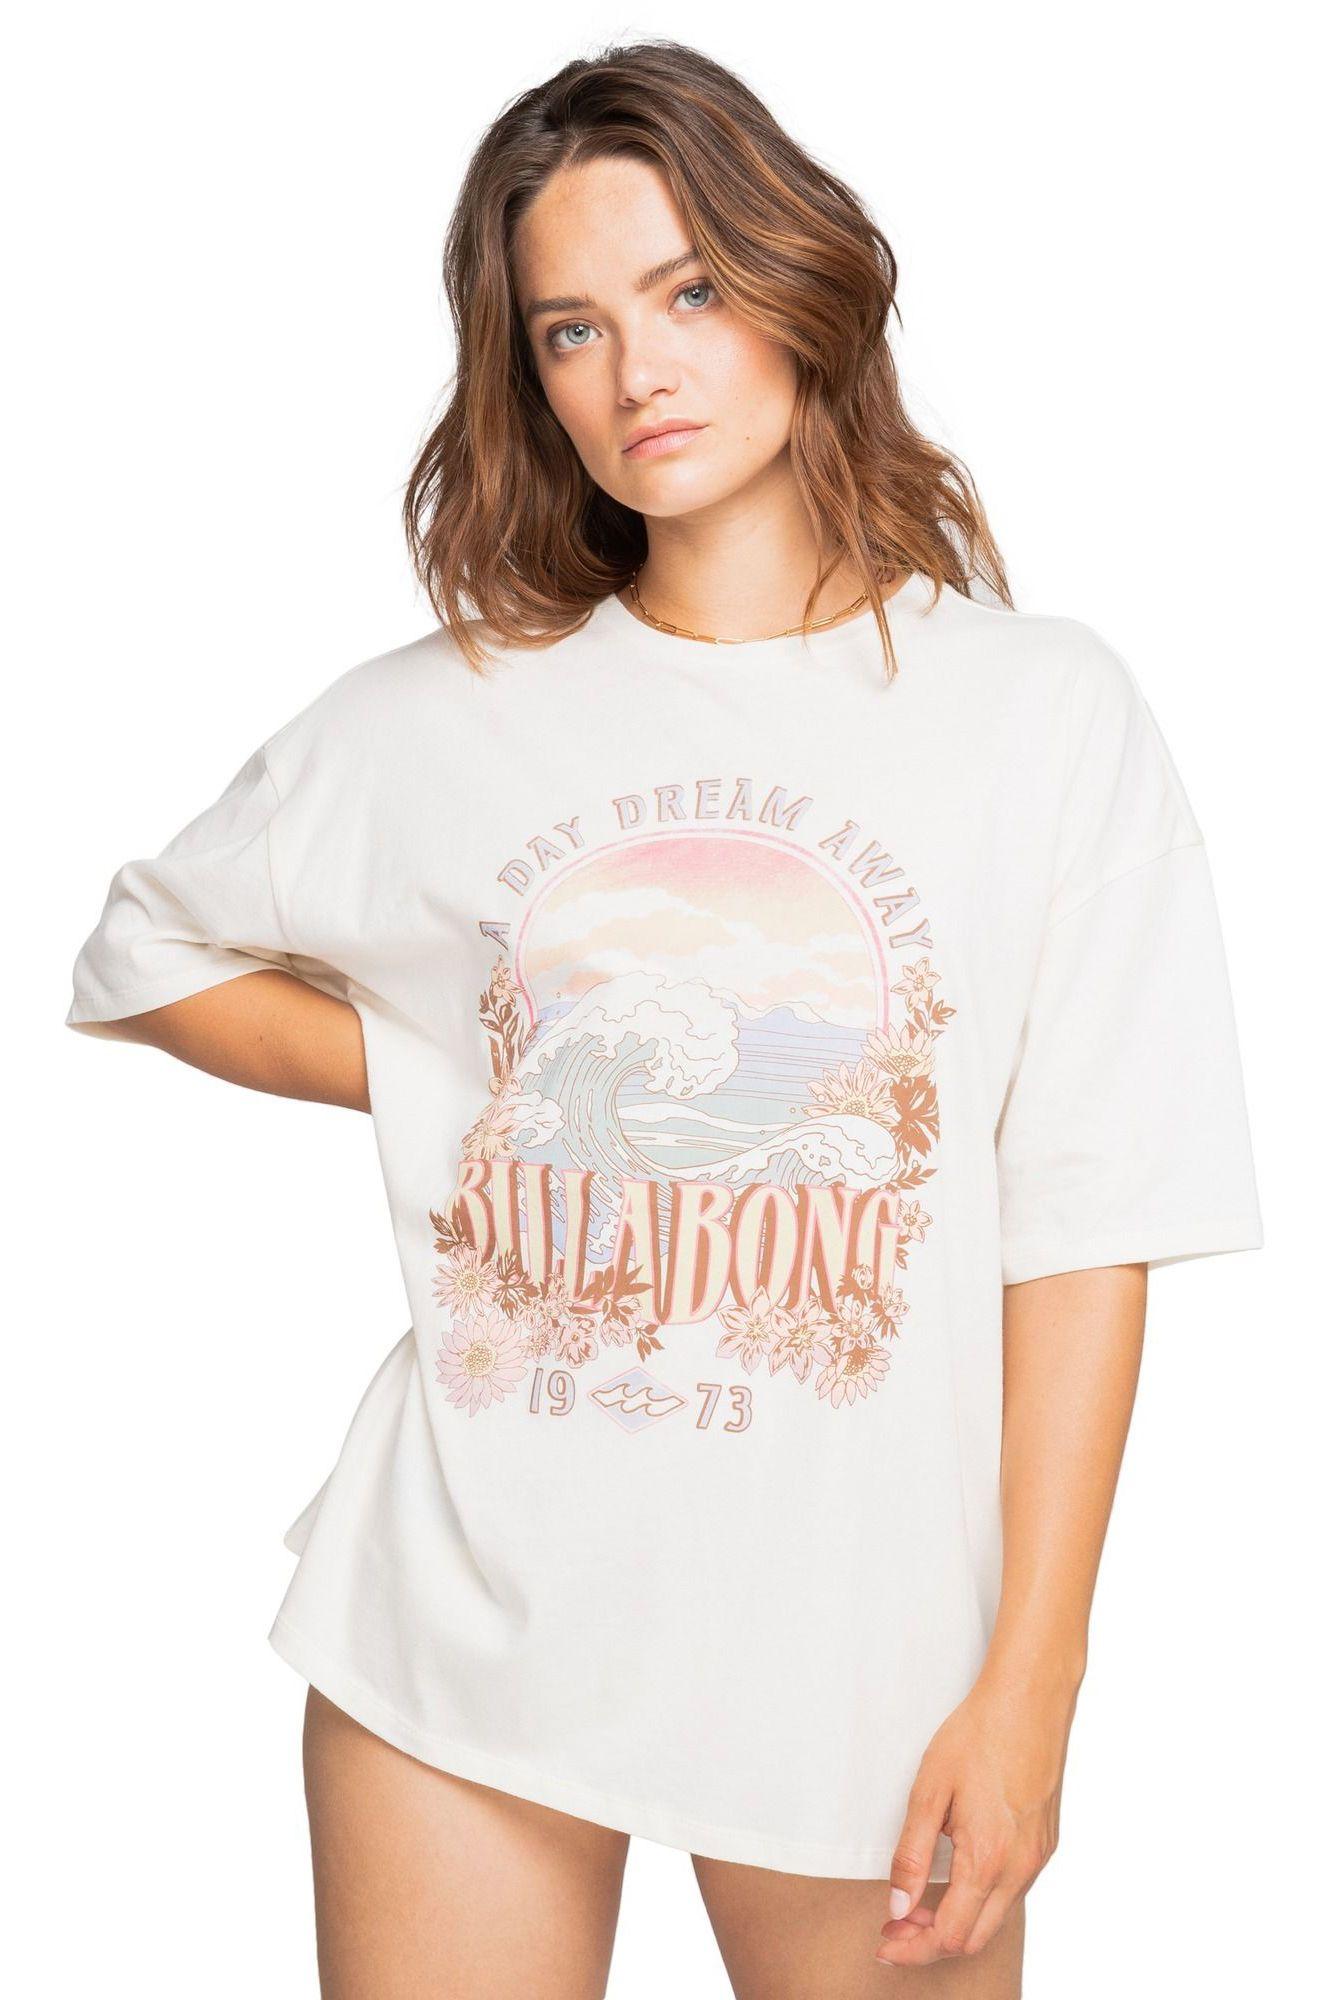 T-Shirt Billabong DREAMY DAY SWEET SESSIONS Salt Crystal